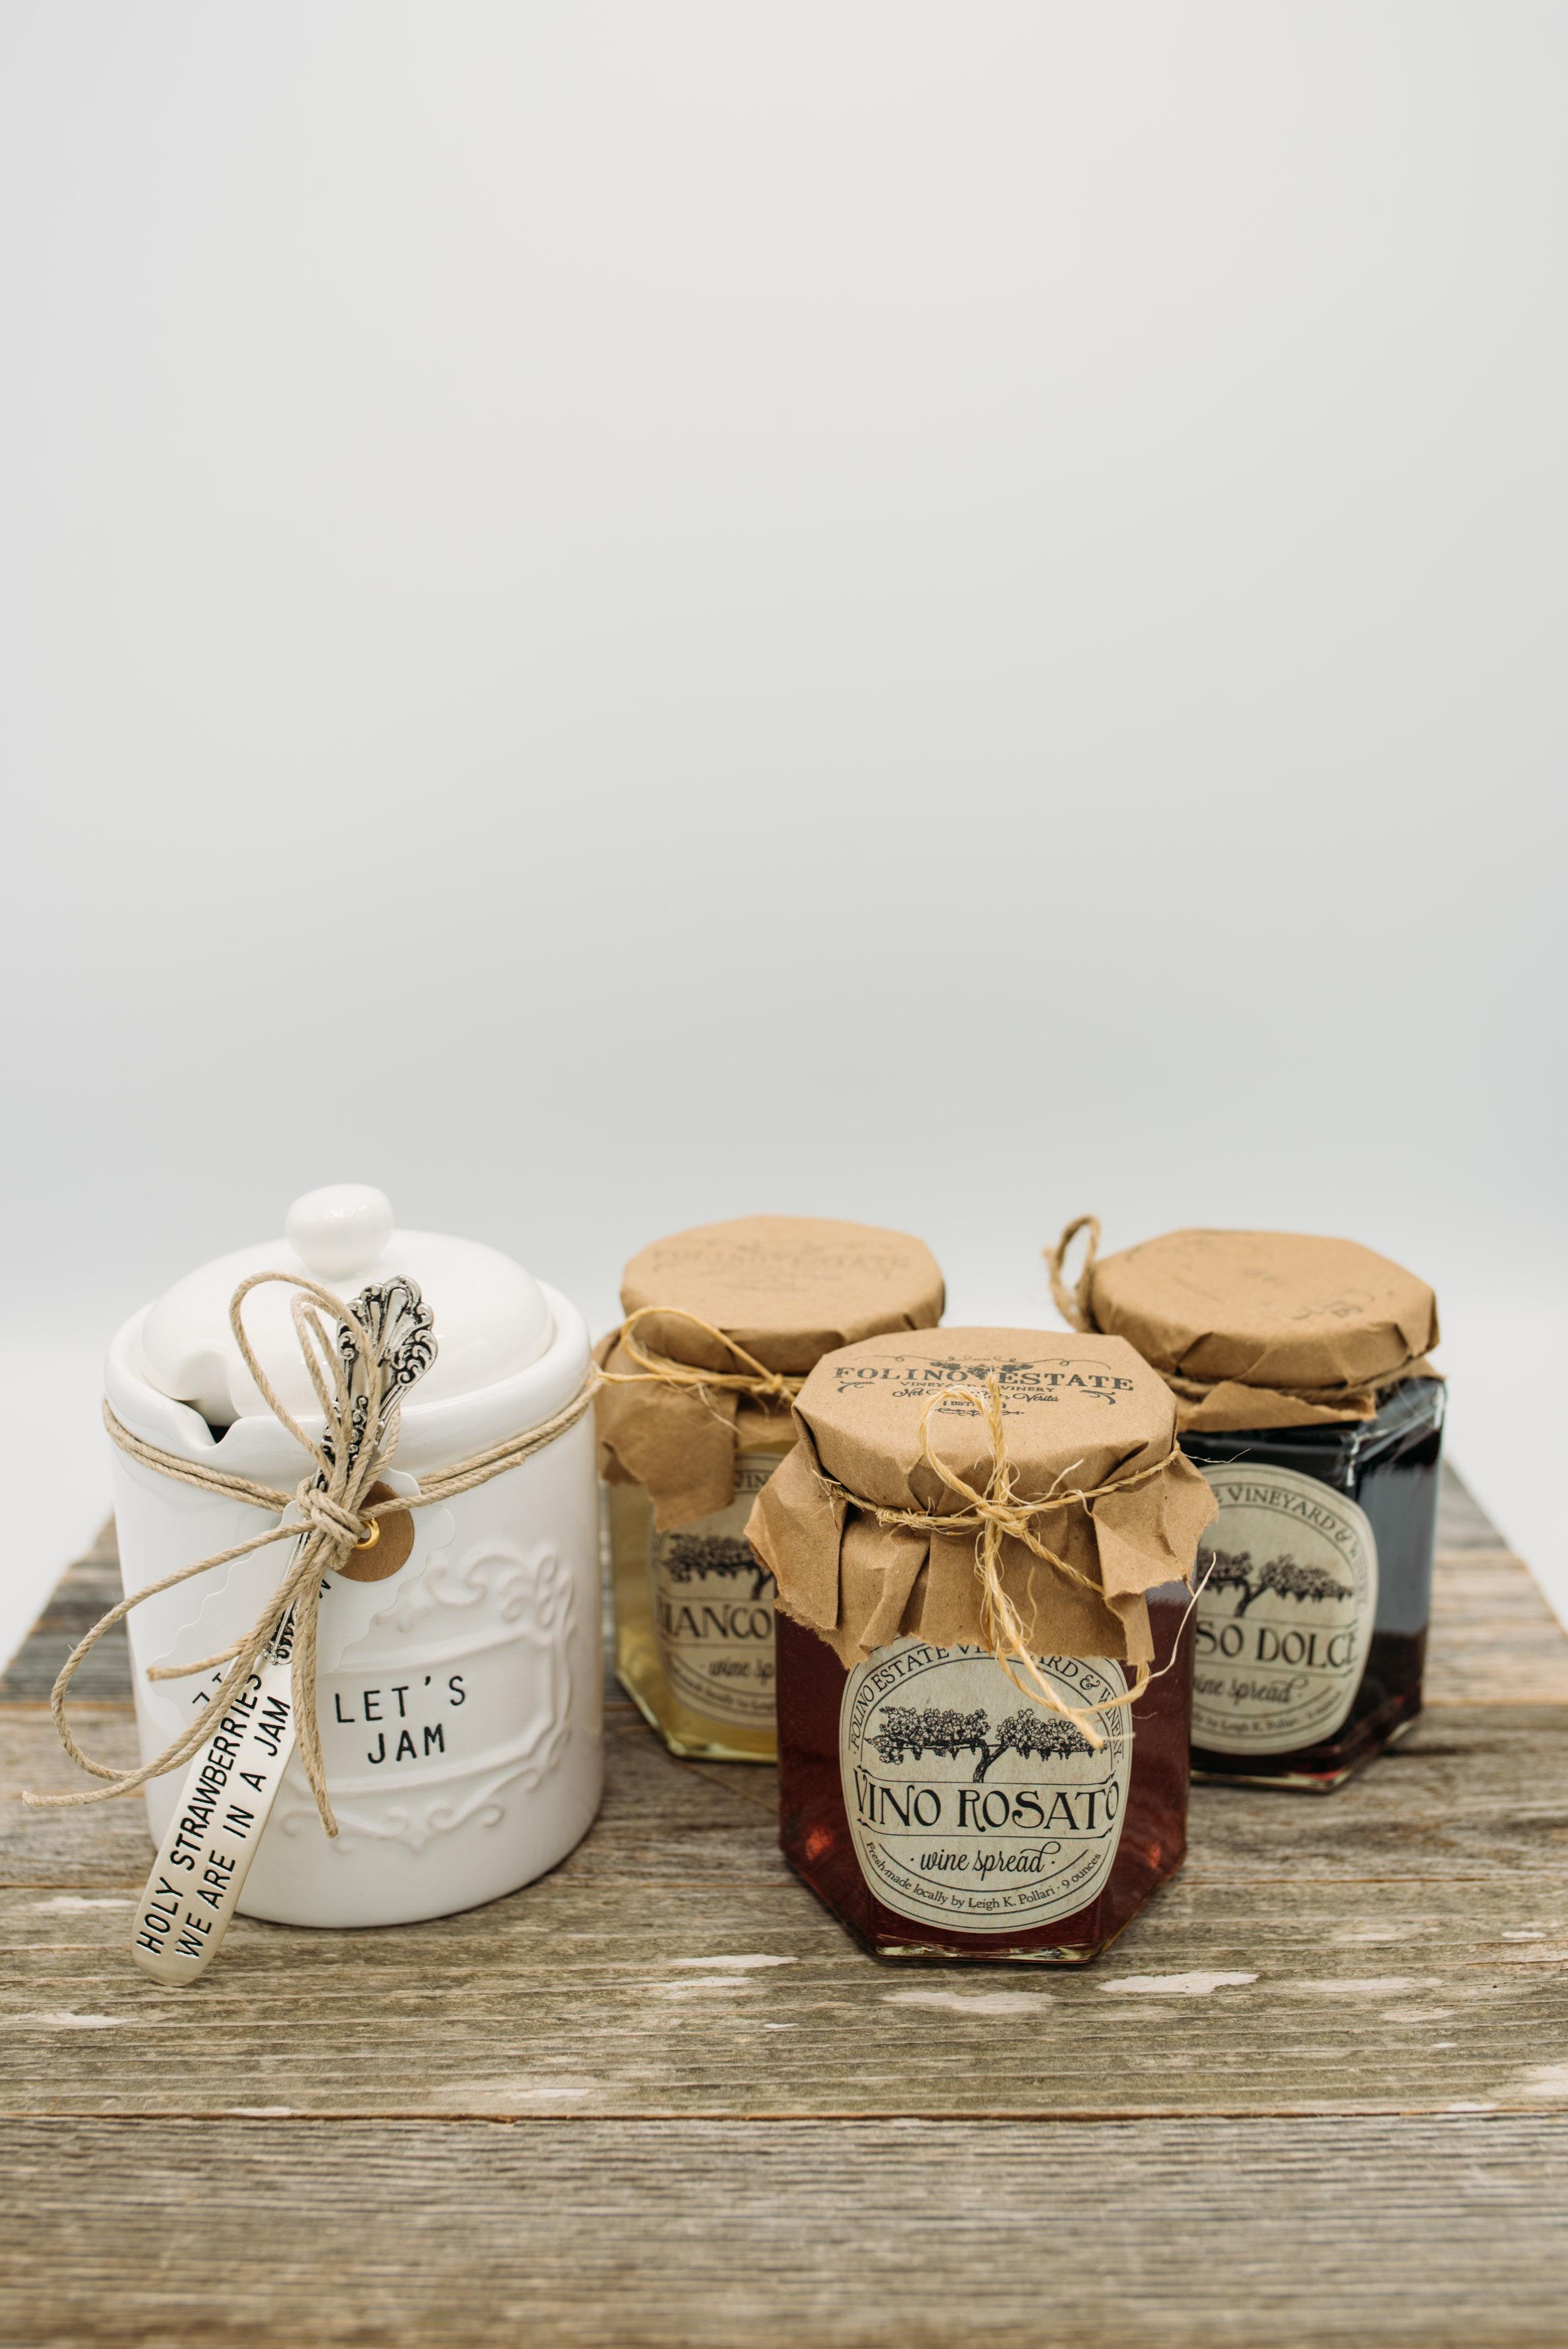 Ceramic Jam Jar -$20.95 Assorted Wine Jams -$14.95 each